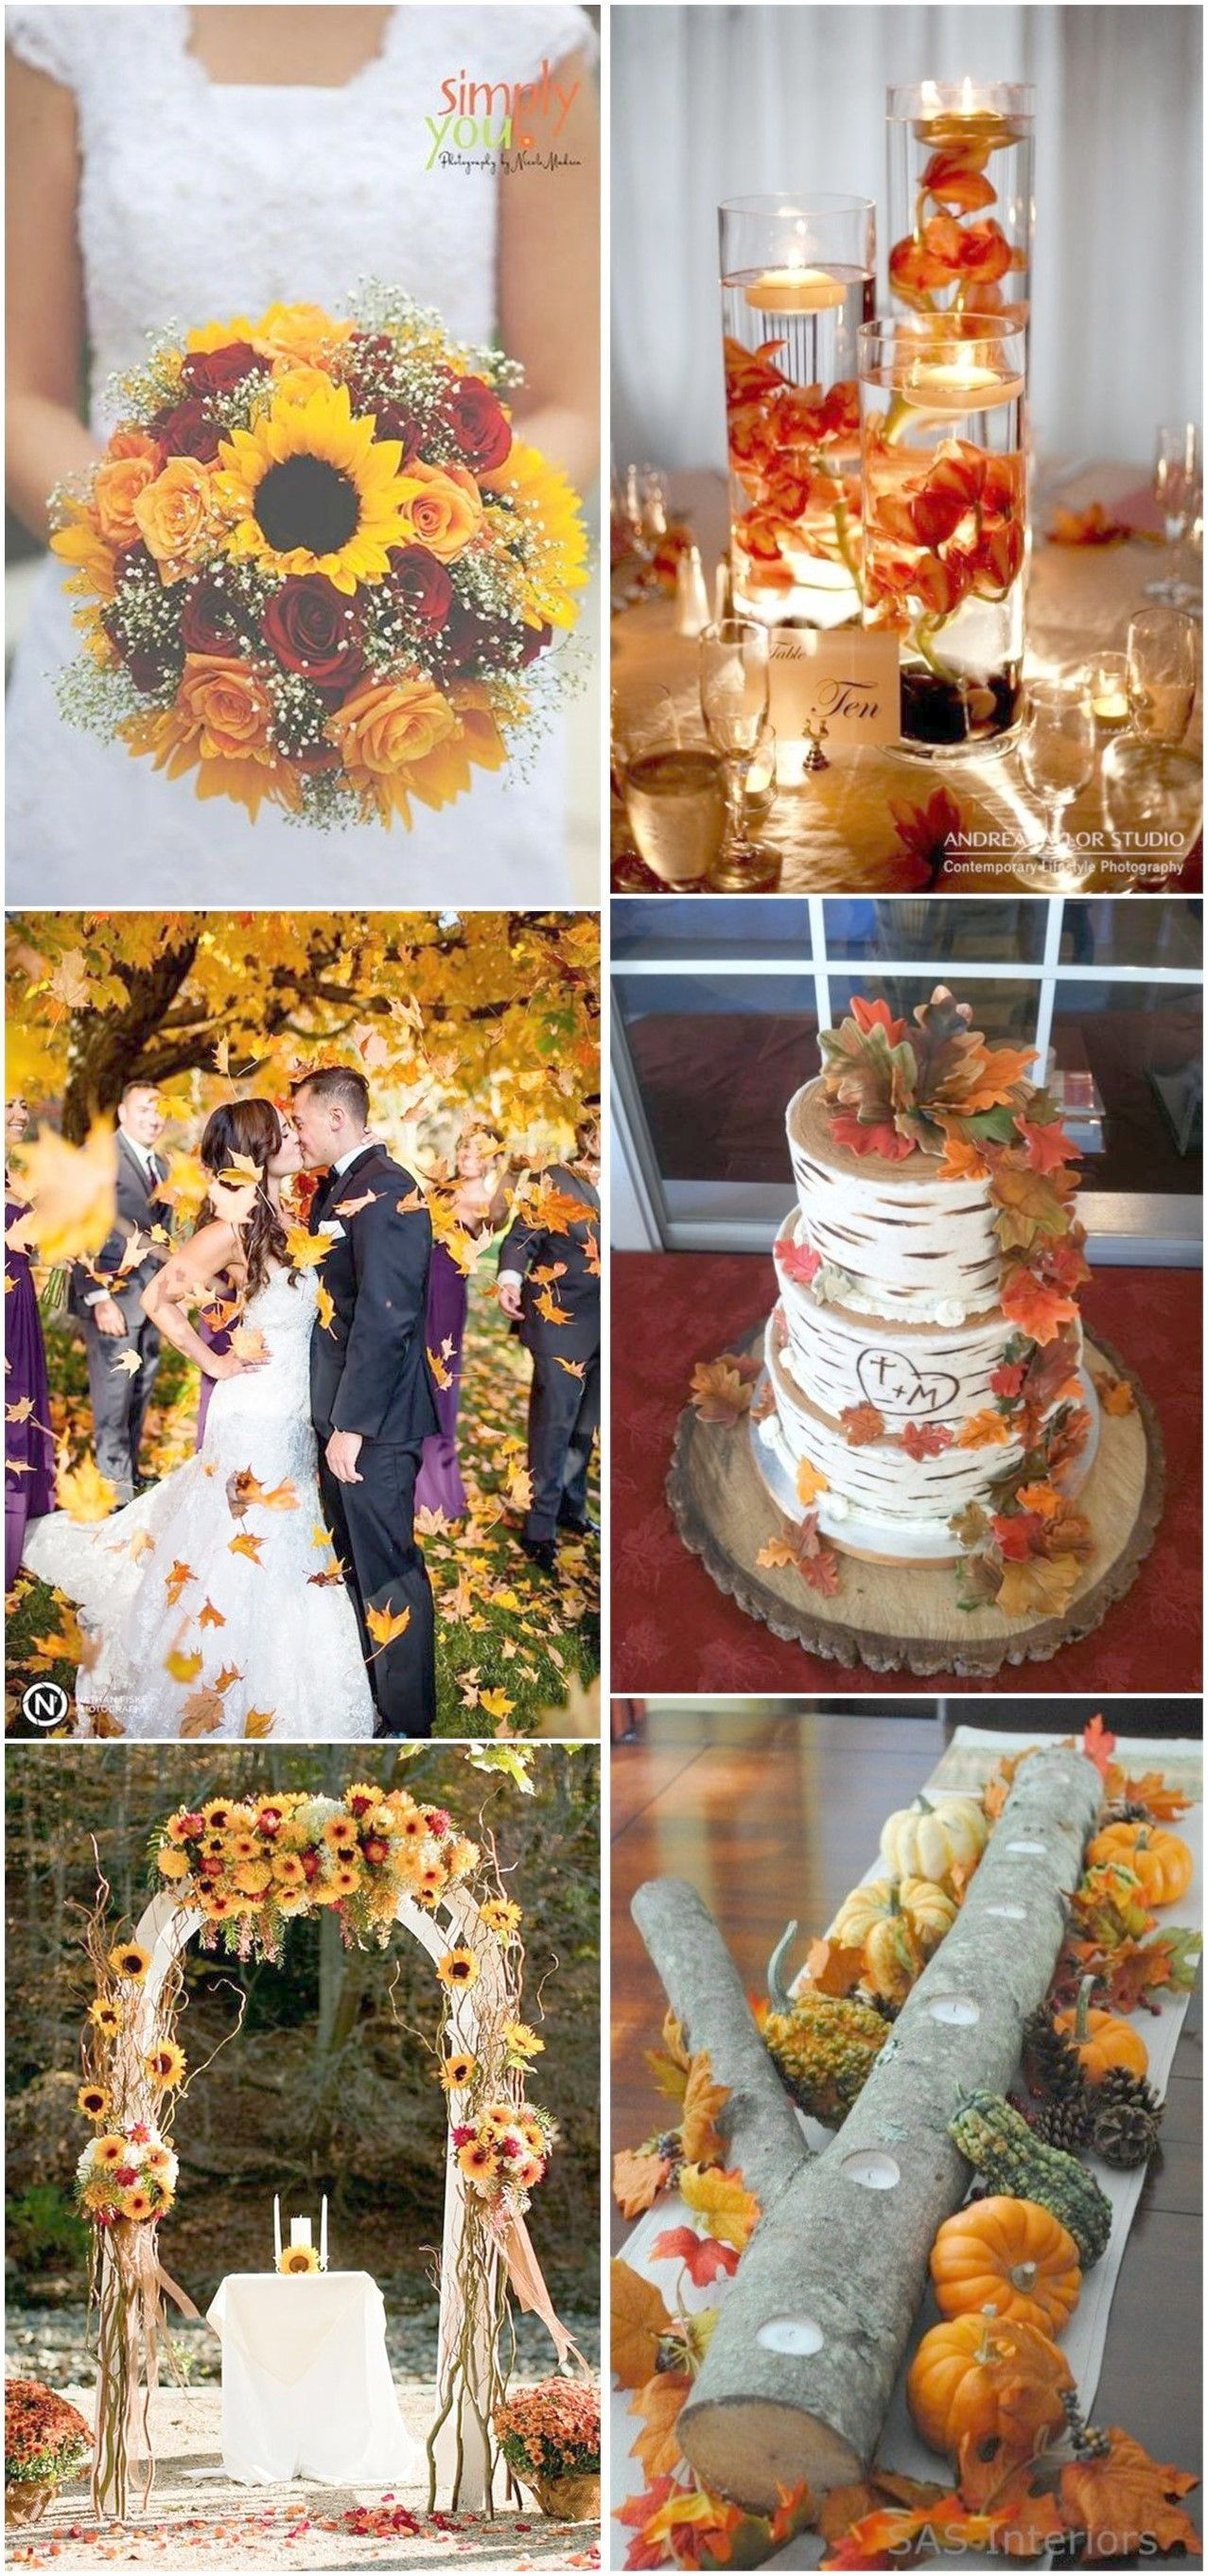 November wedding decoration ideas  Wedding Ideas Summer Wedding Ideas Entertain Guests  Wedding Ideas